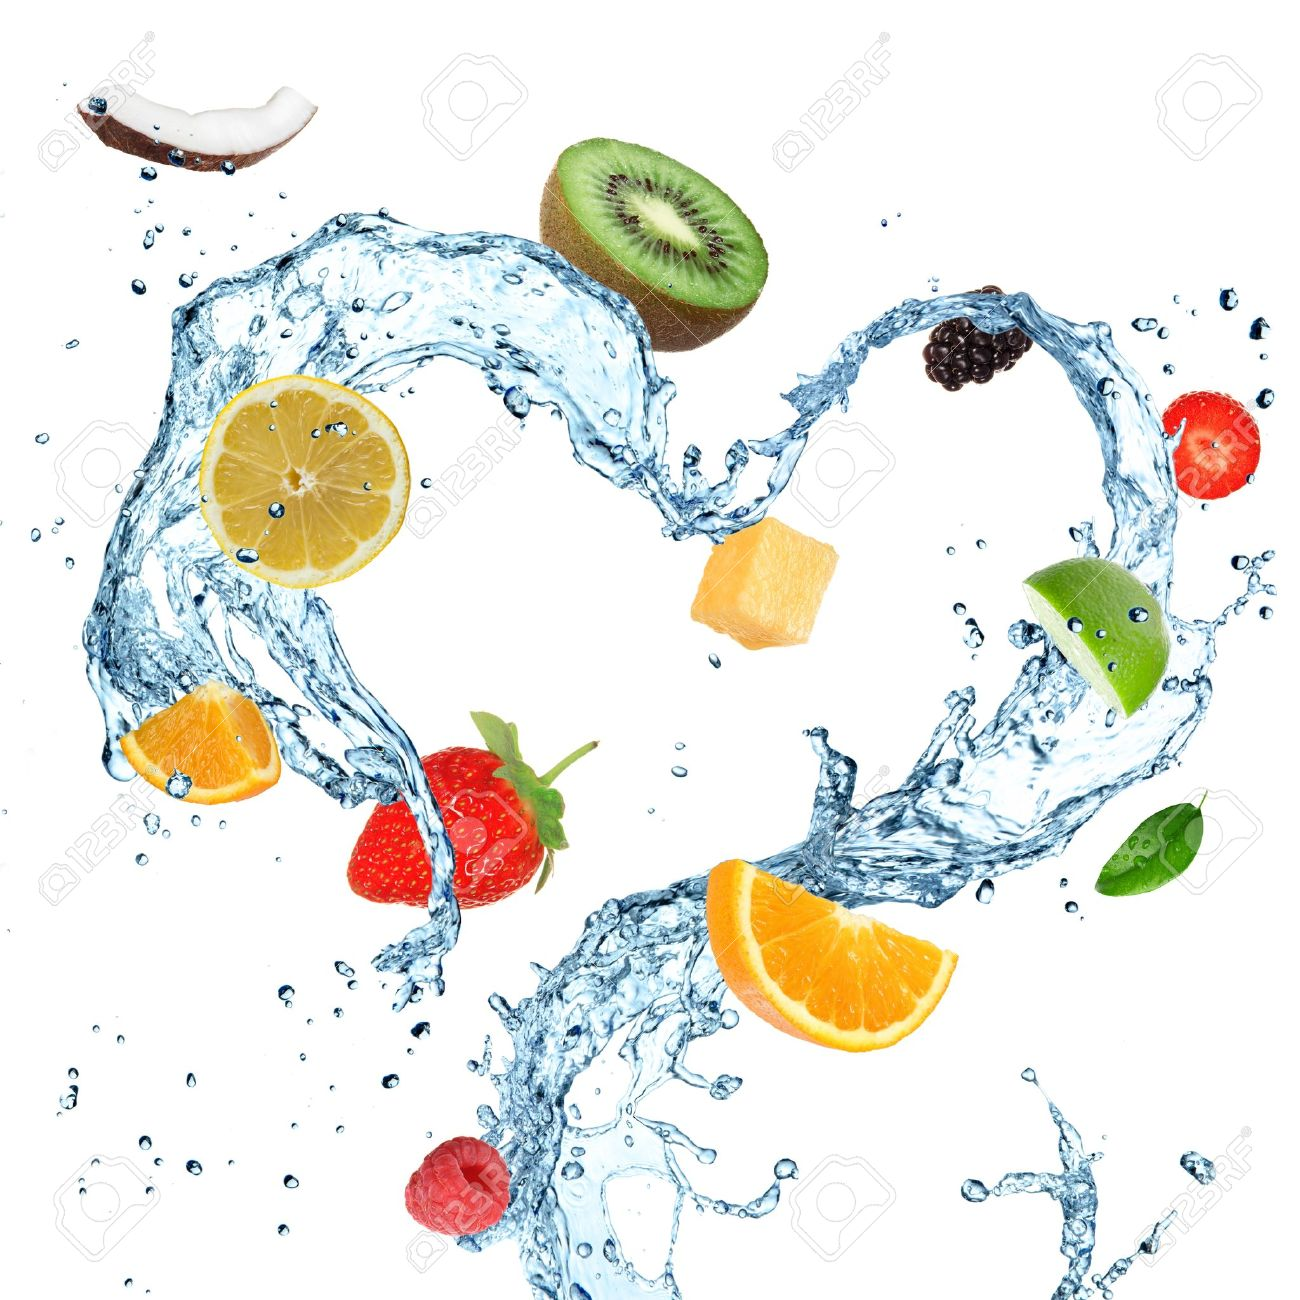 Fruit in water splash heart Stock Photo - 14730646